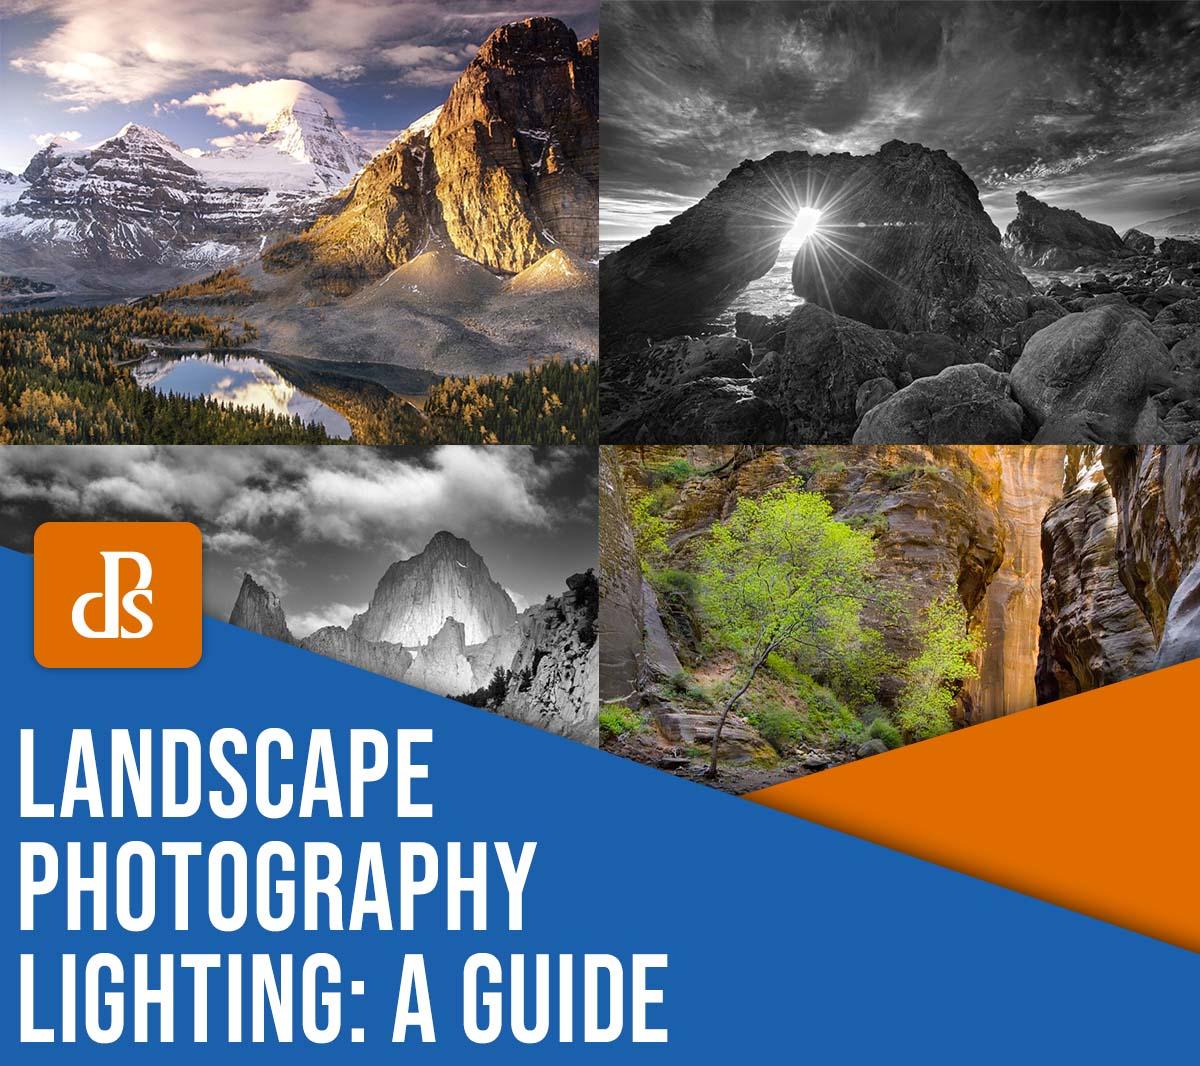 landscape photography lighting guide